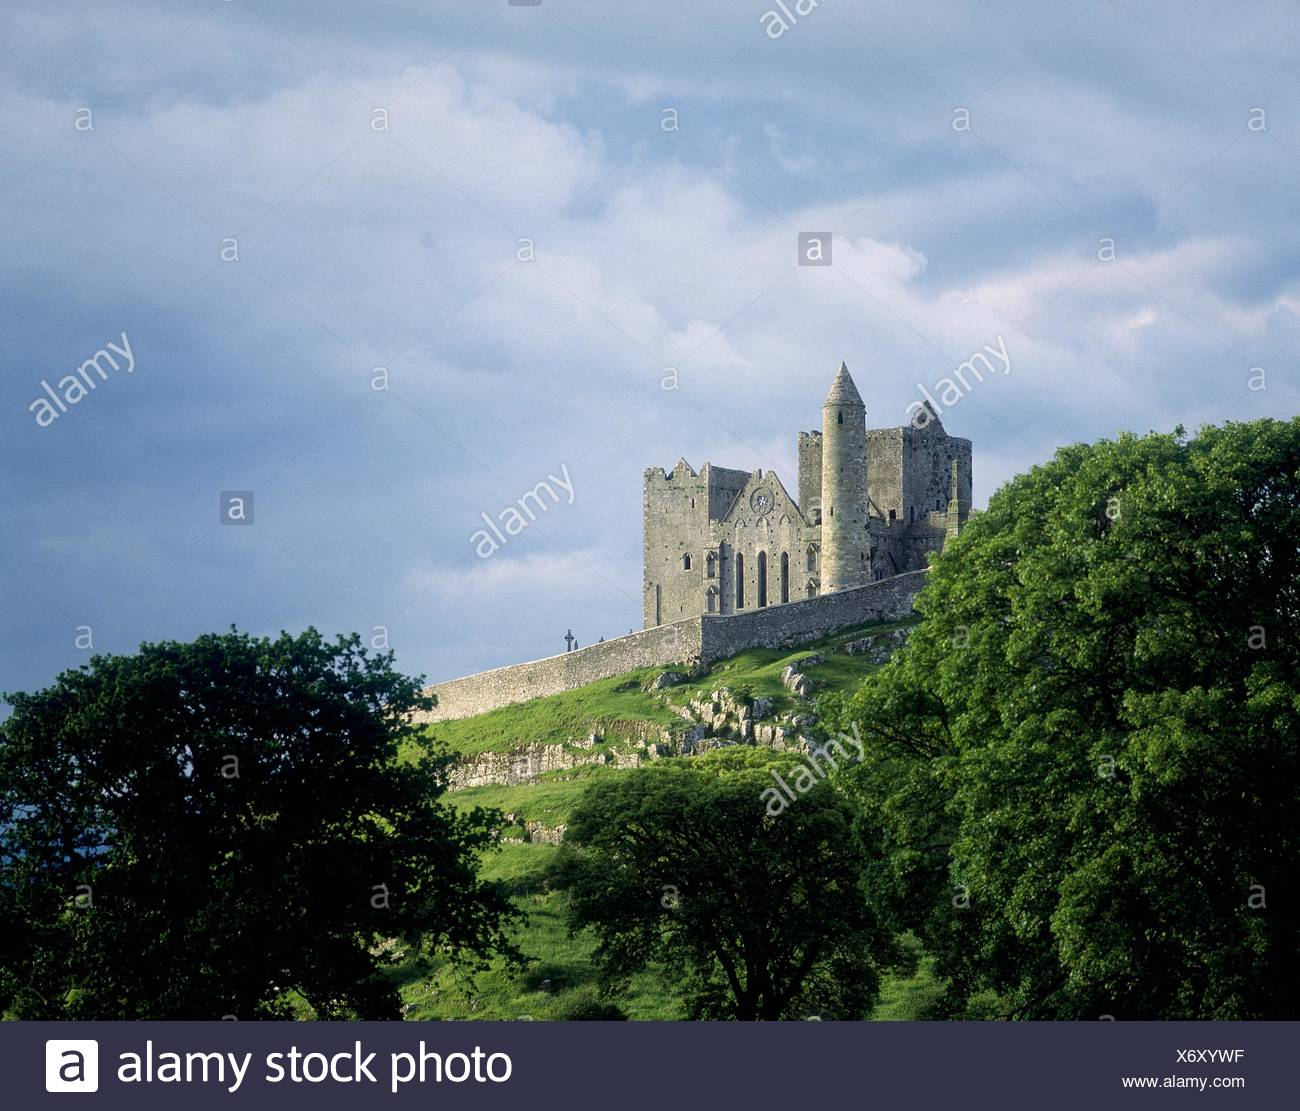 Cashel Rock insediamento monastico, Cahel, Co Tipperary, Irlanda Immagini Stock